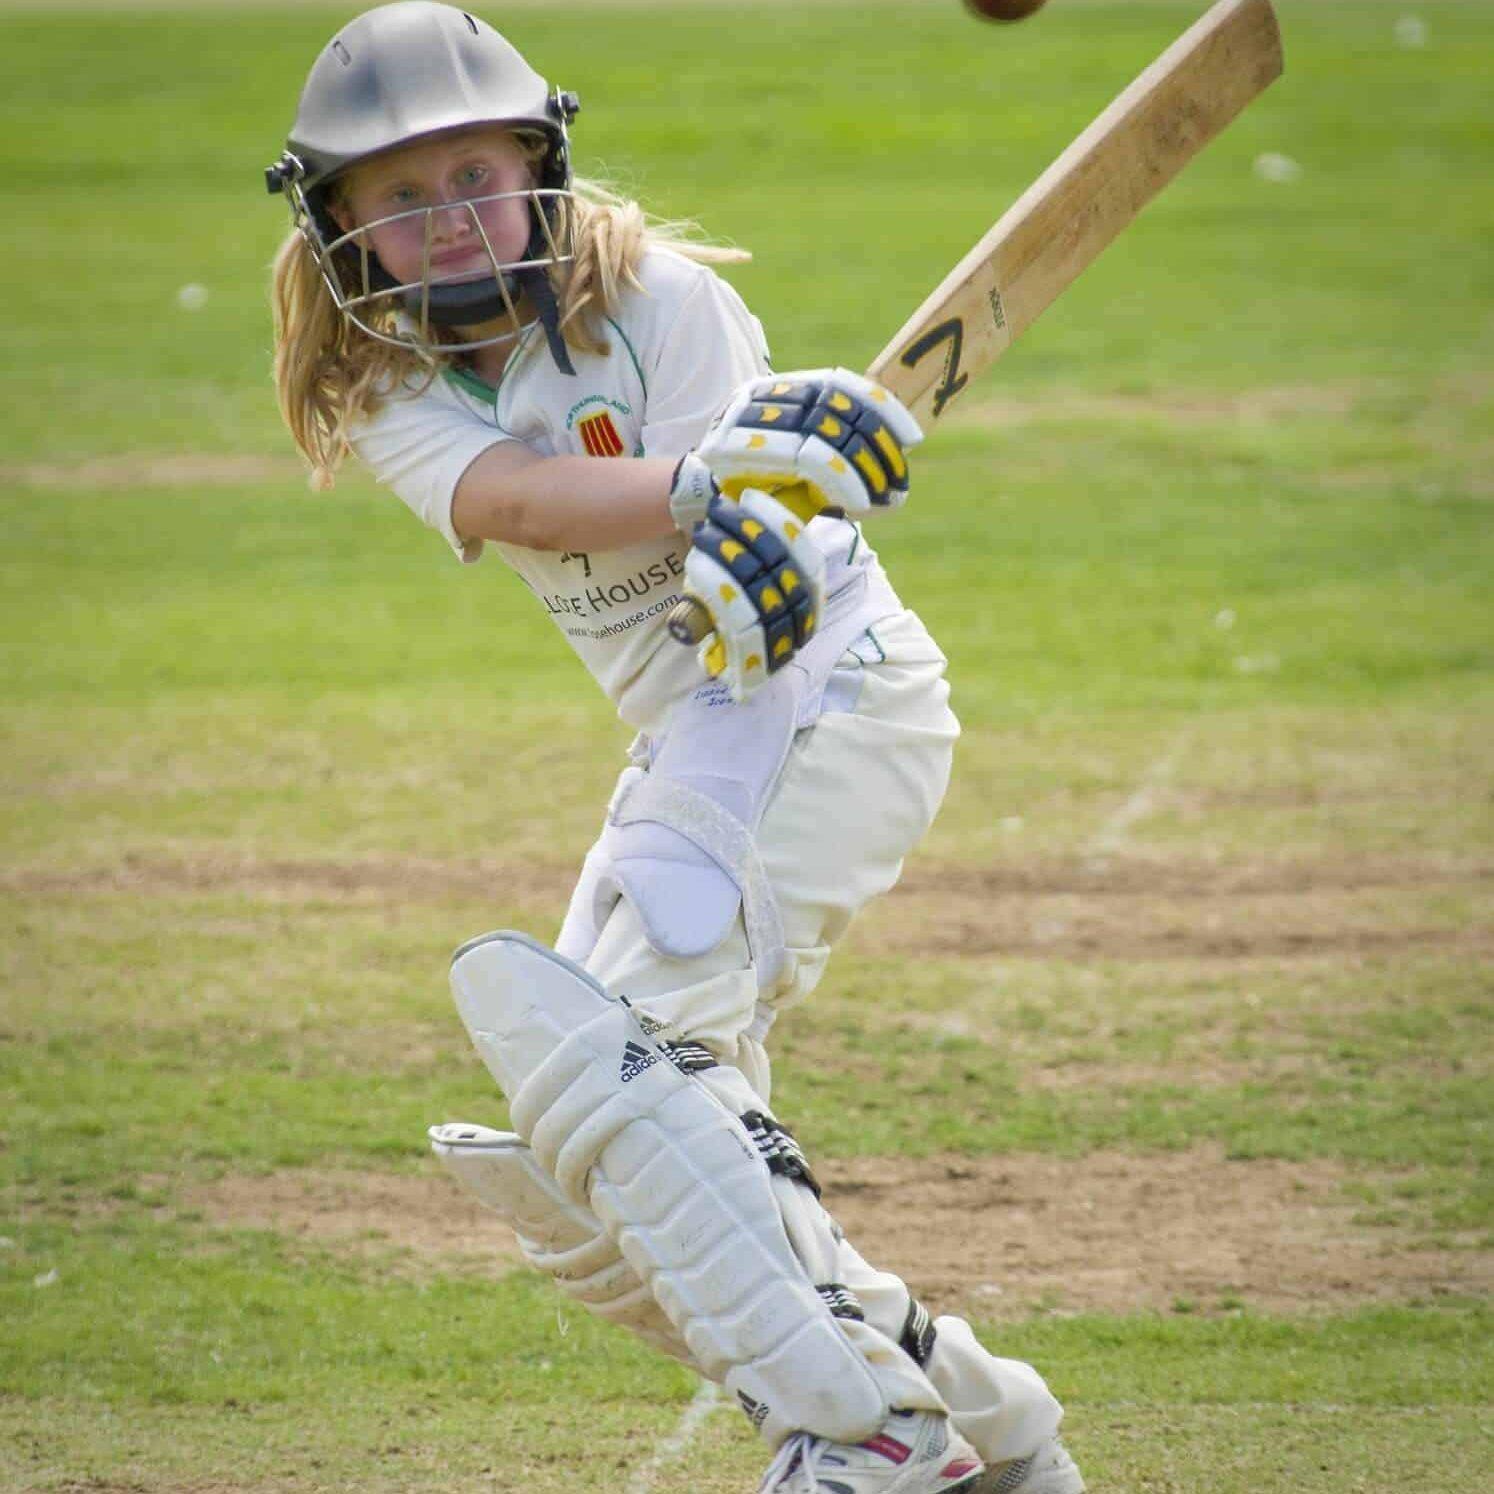 MFD Advice: Cricket